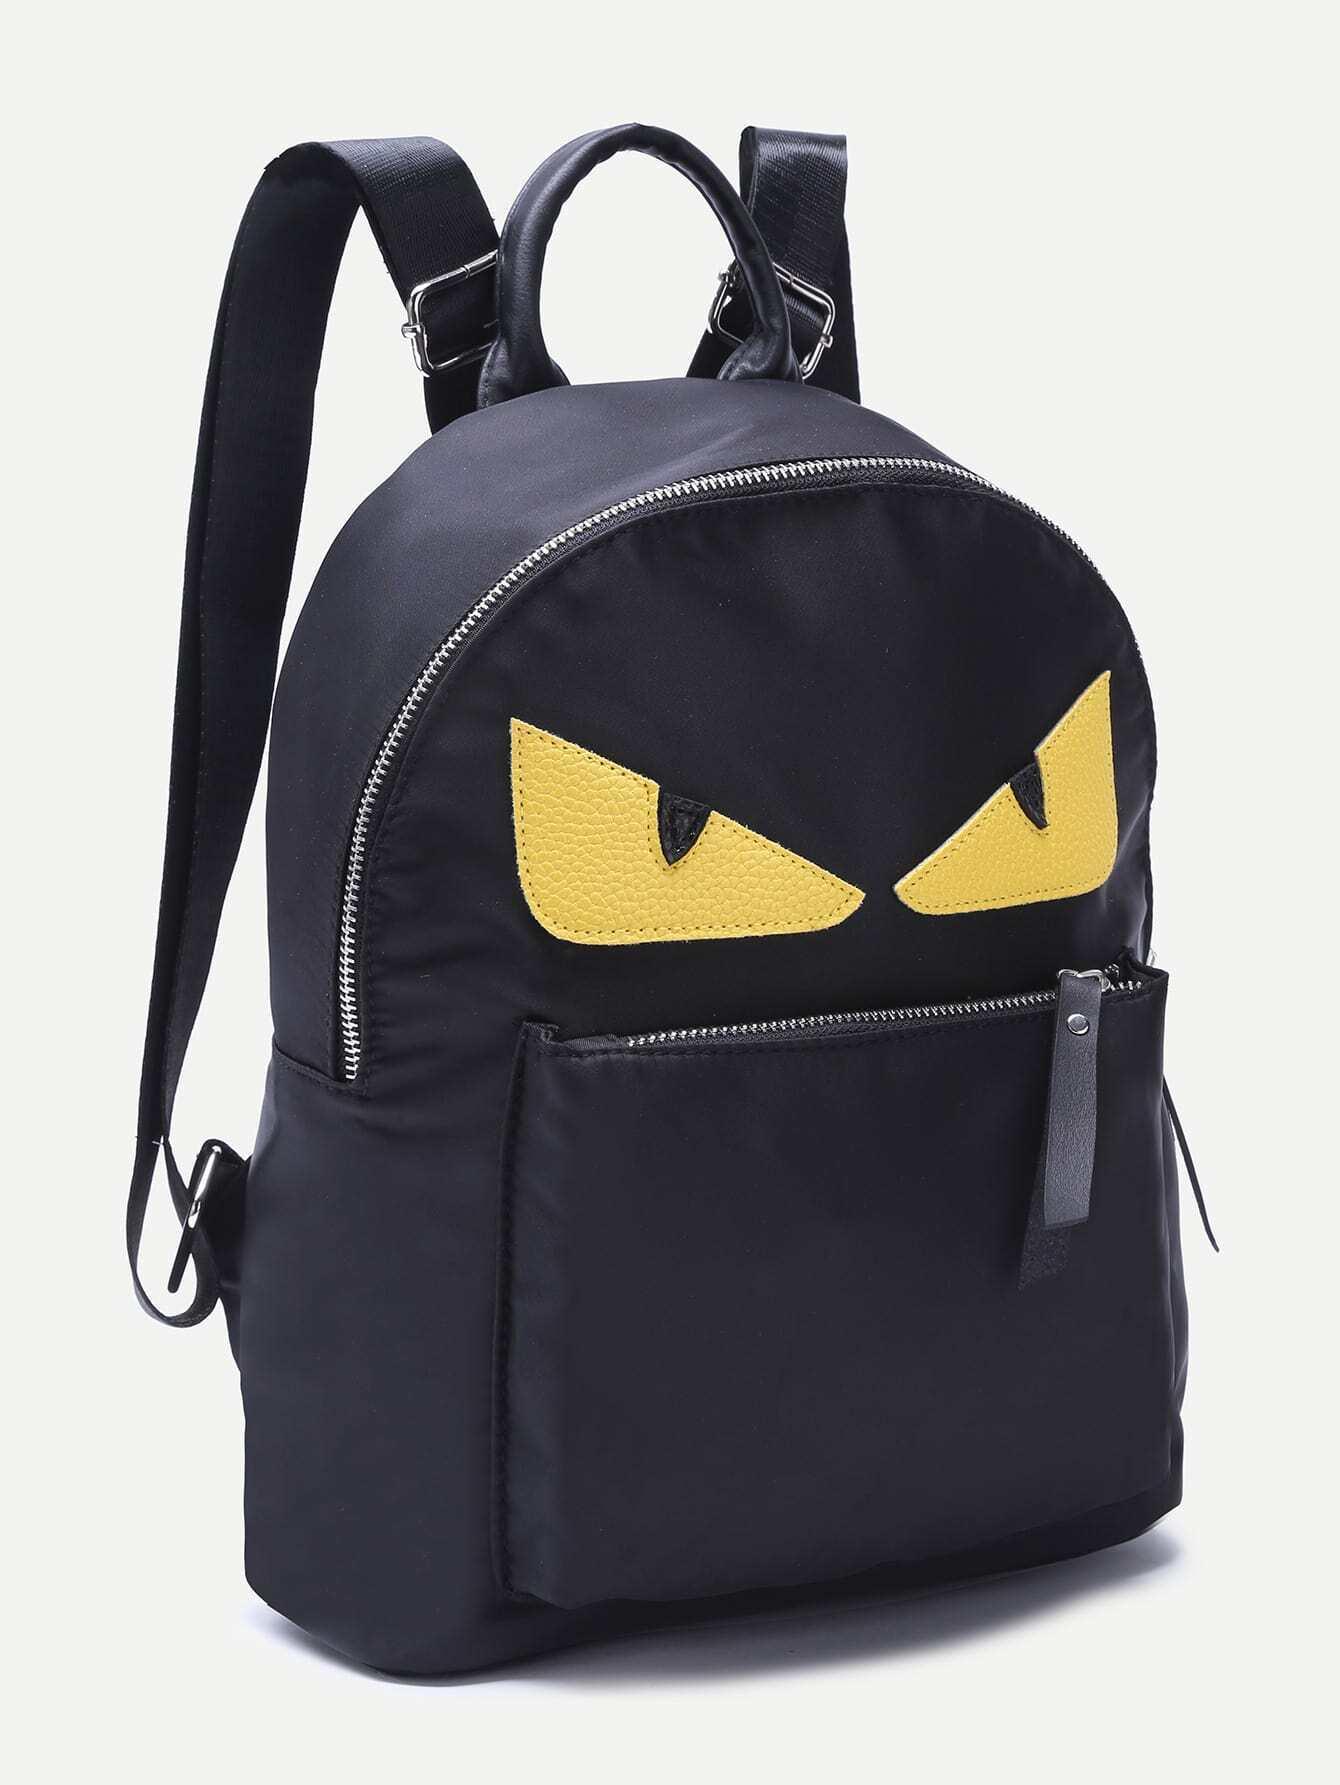 sac dos en nylon avec zip forme de monstre french romwe. Black Bedroom Furniture Sets. Home Design Ideas